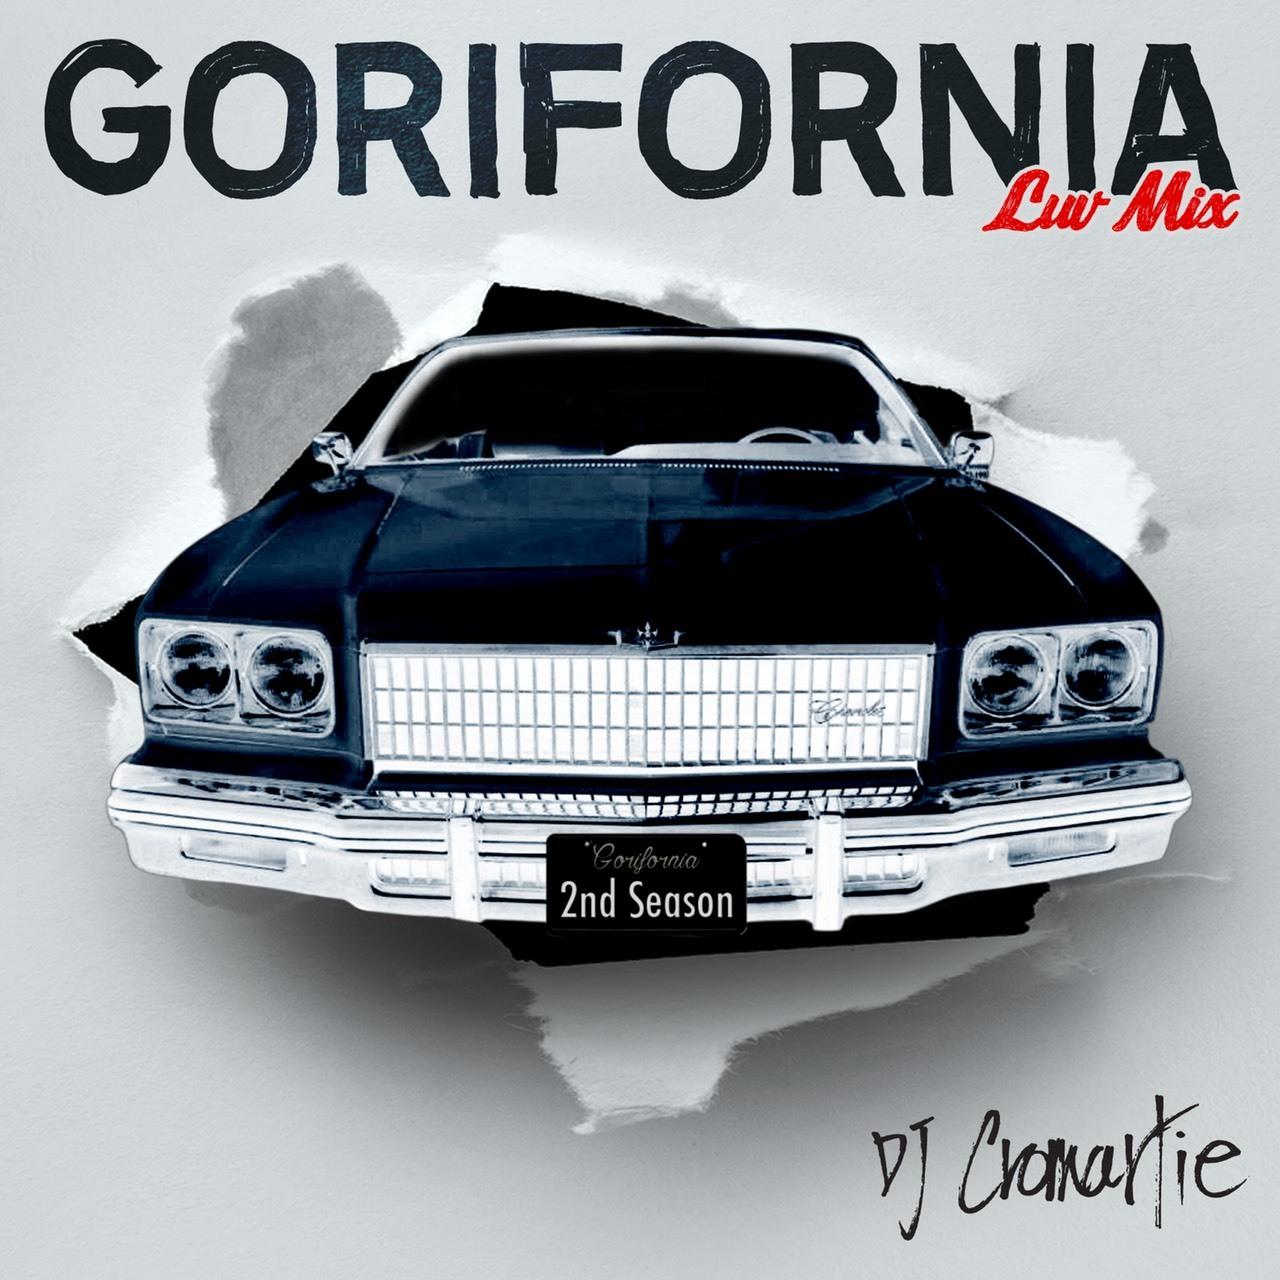 [MIX CD] DjCromartie / Gorifornia LUV Mix 2nd Season